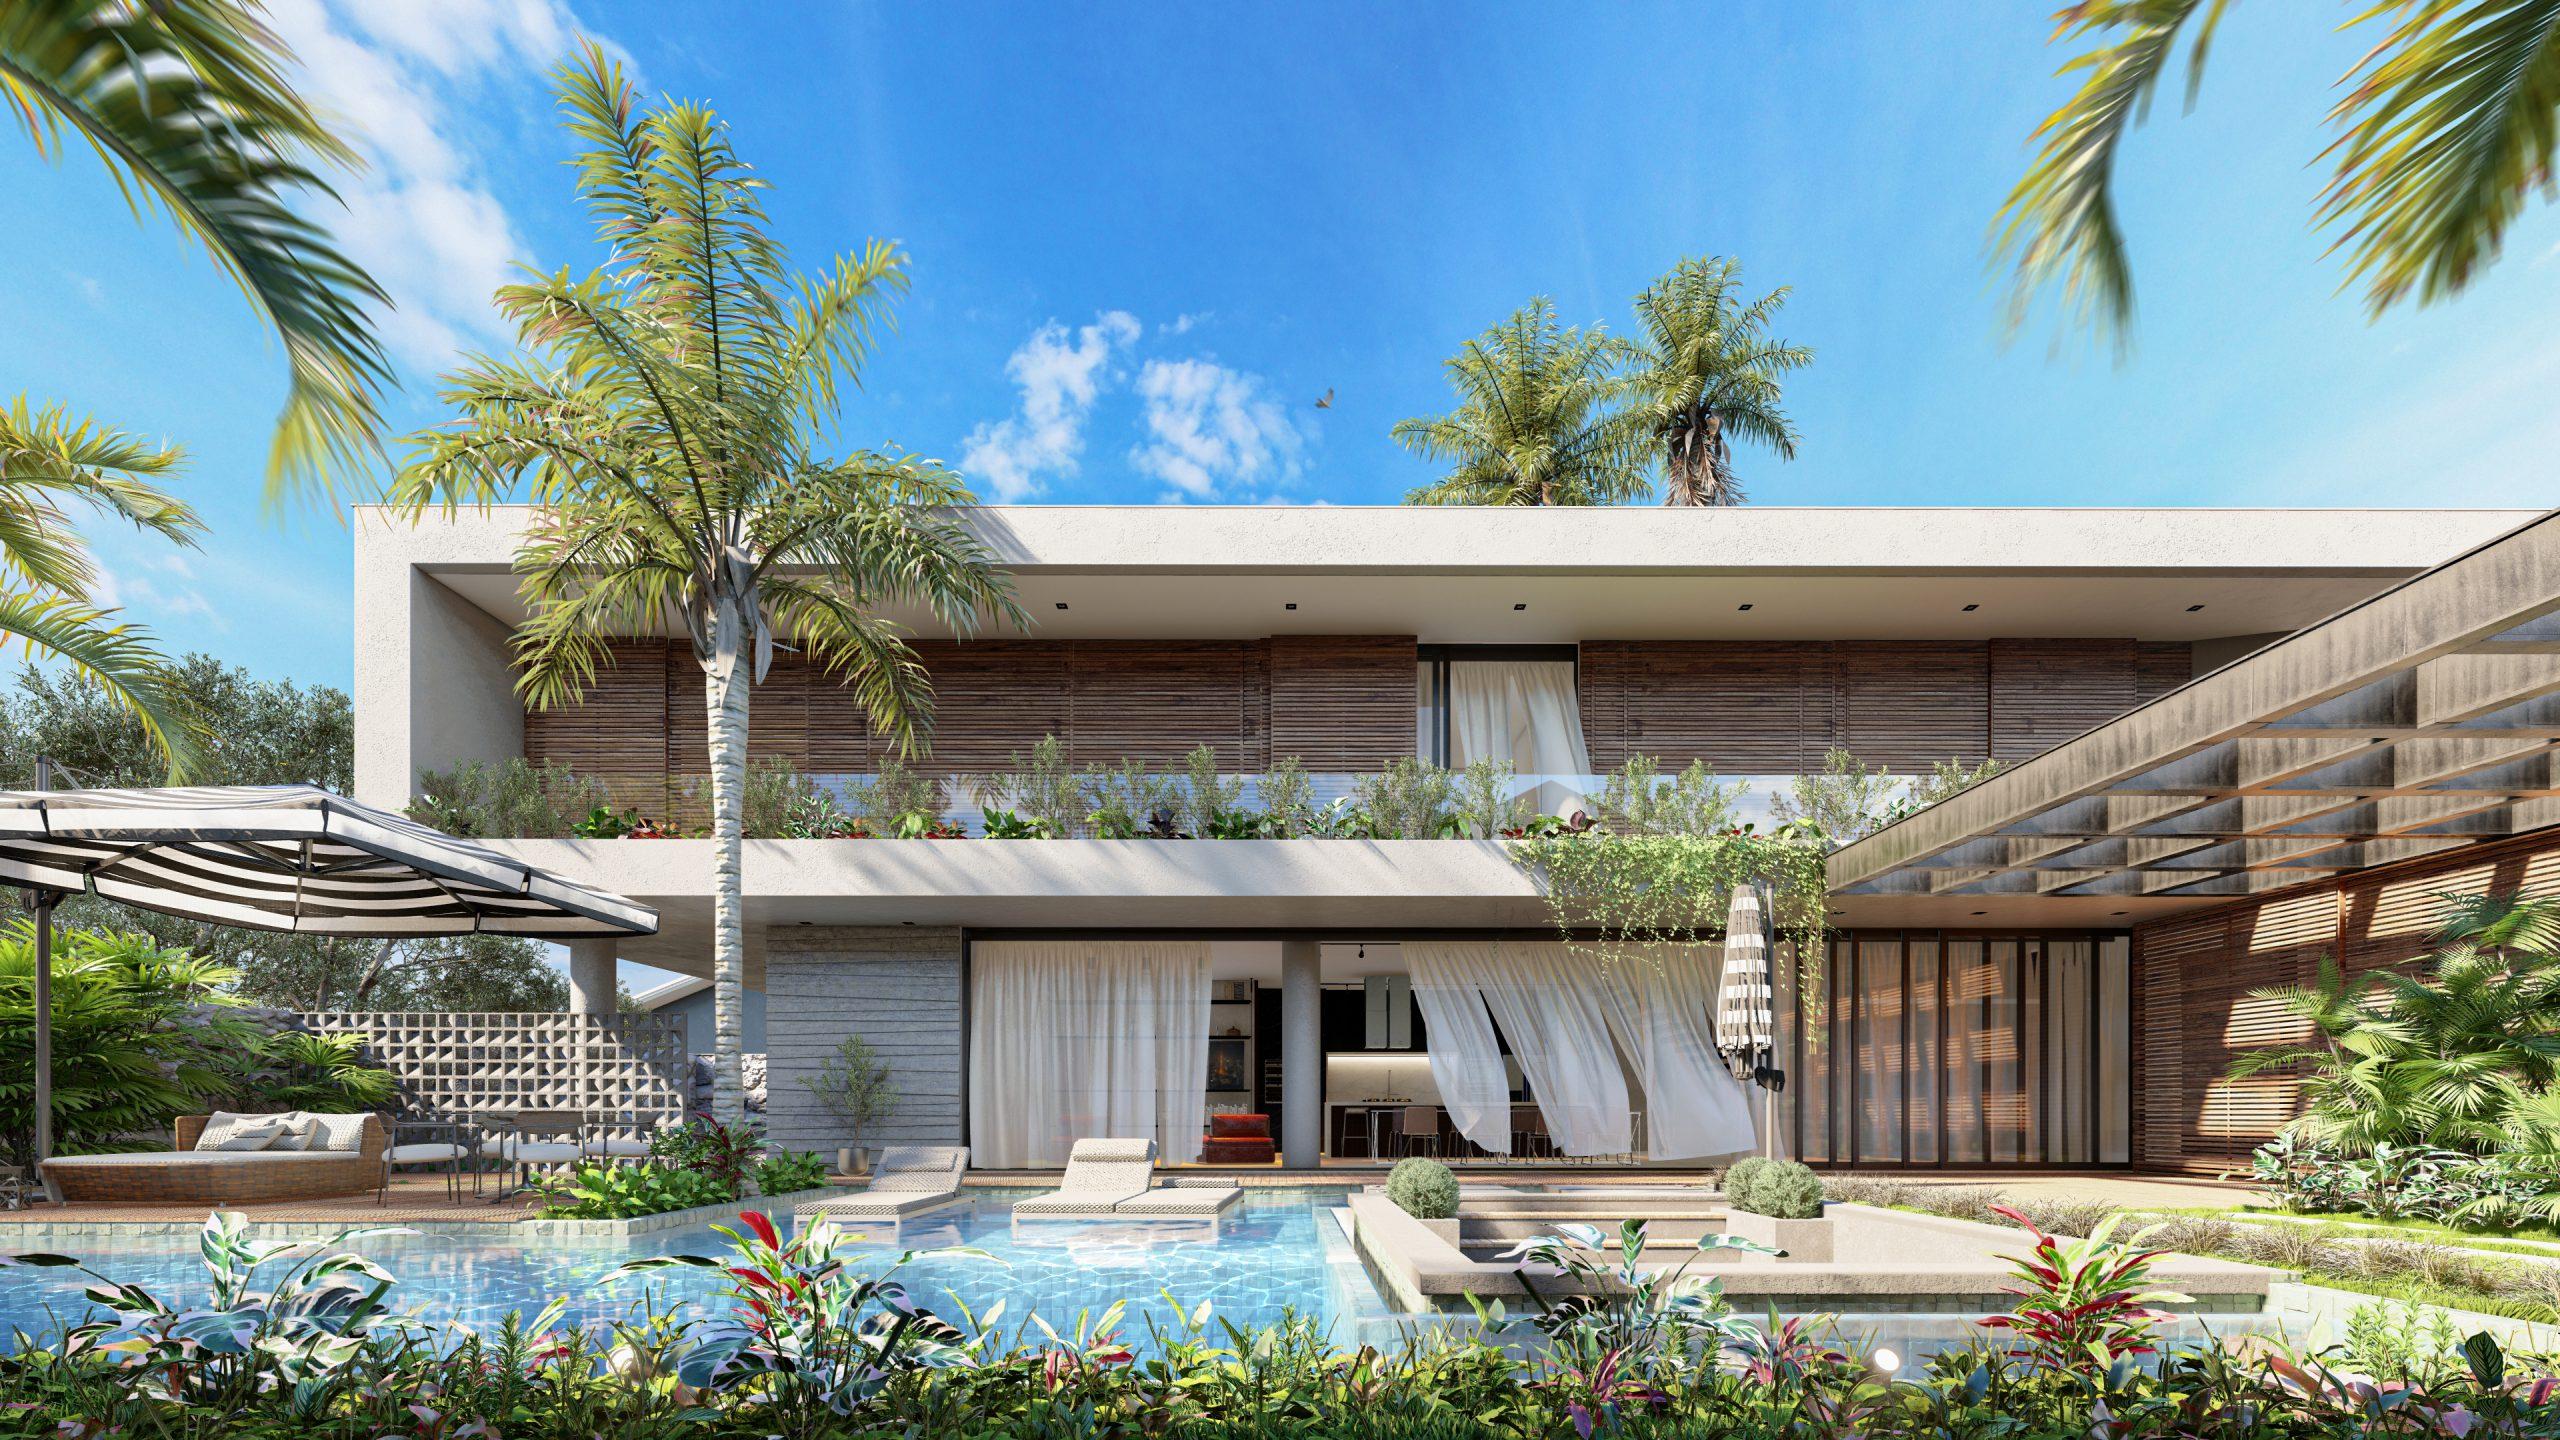 Yutaka House, rendered by Gui Felix. Project by Roberto Yutaka